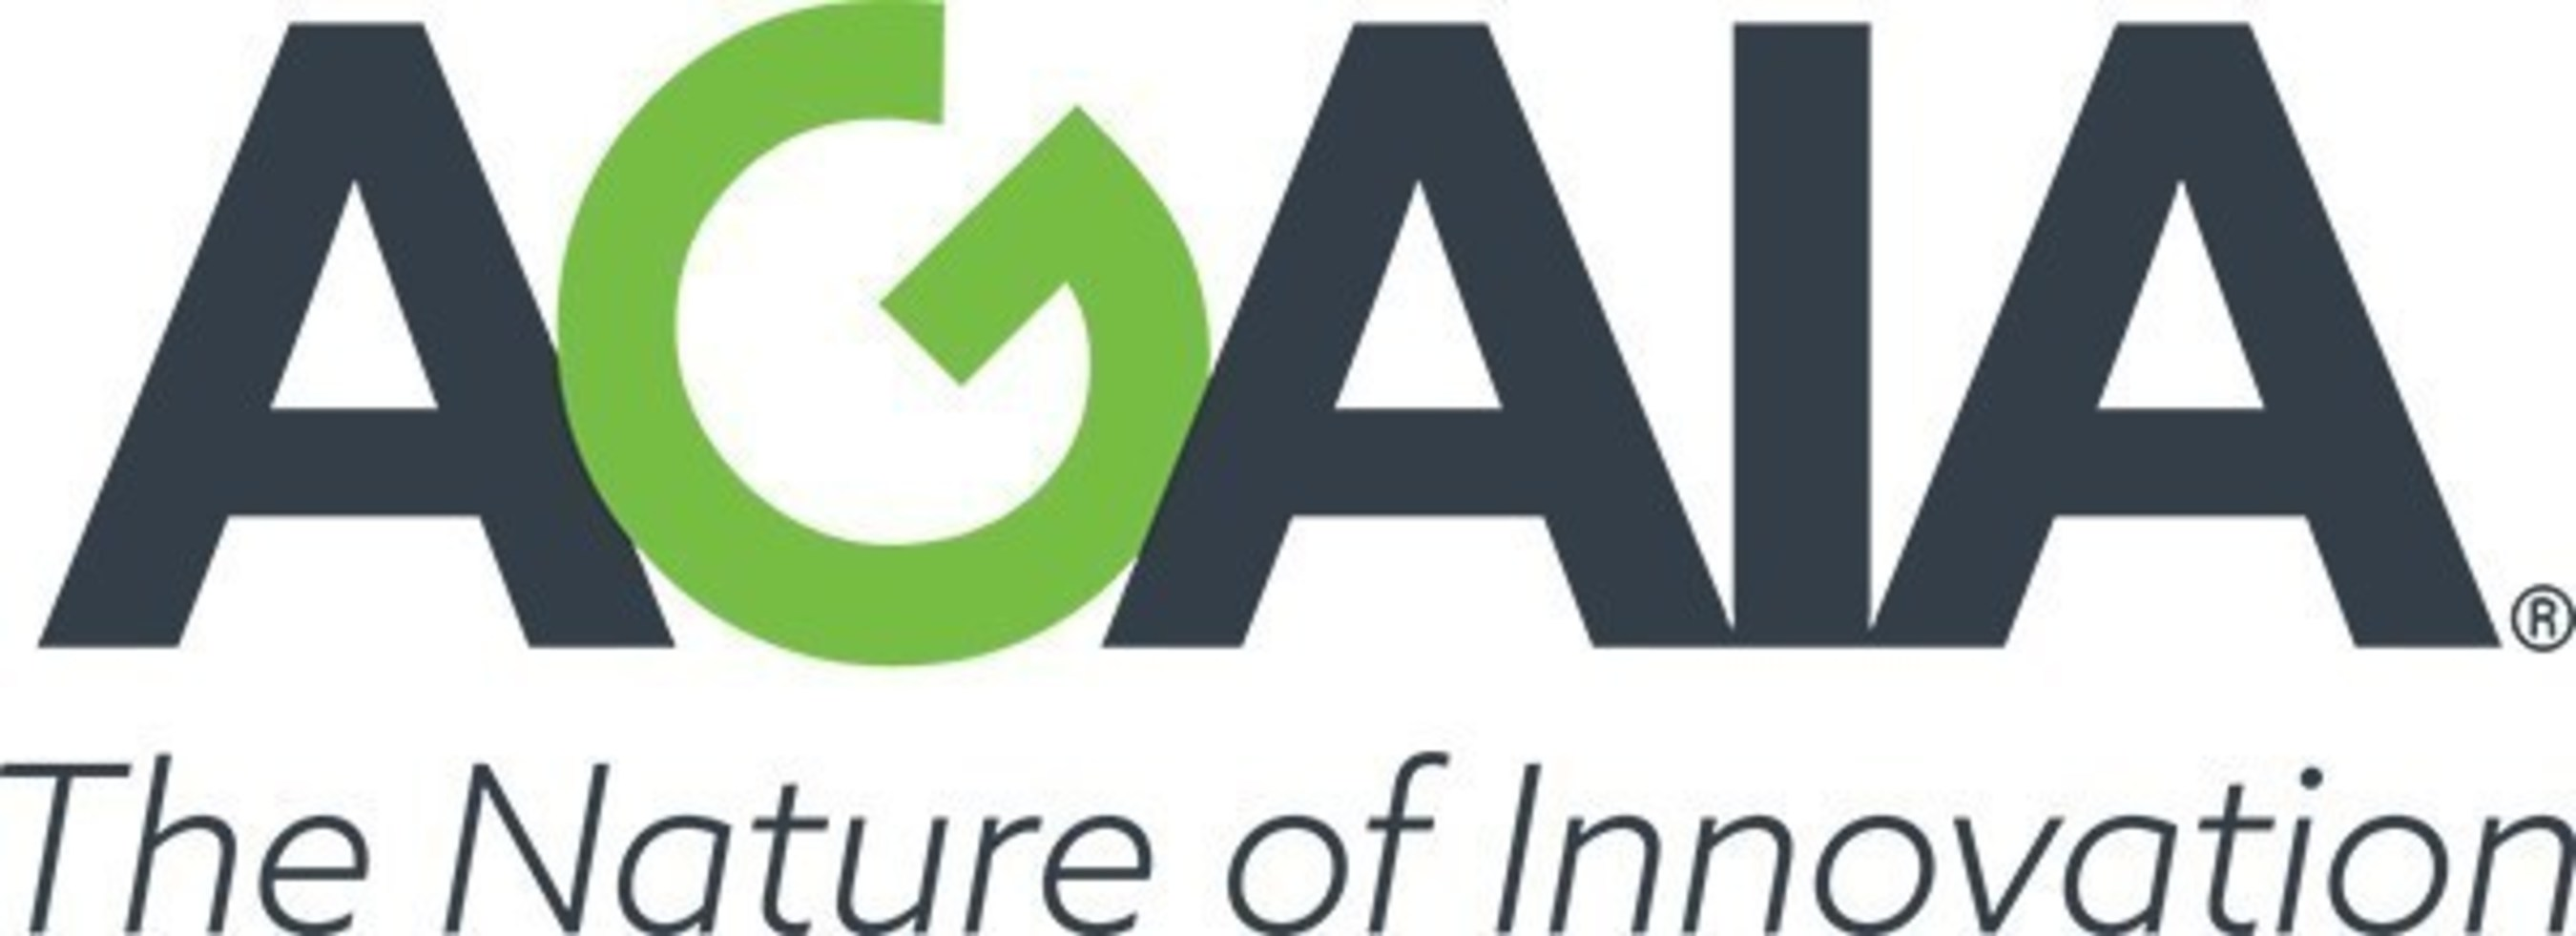 Agaia, Inc. | Makers of Evolve(R)